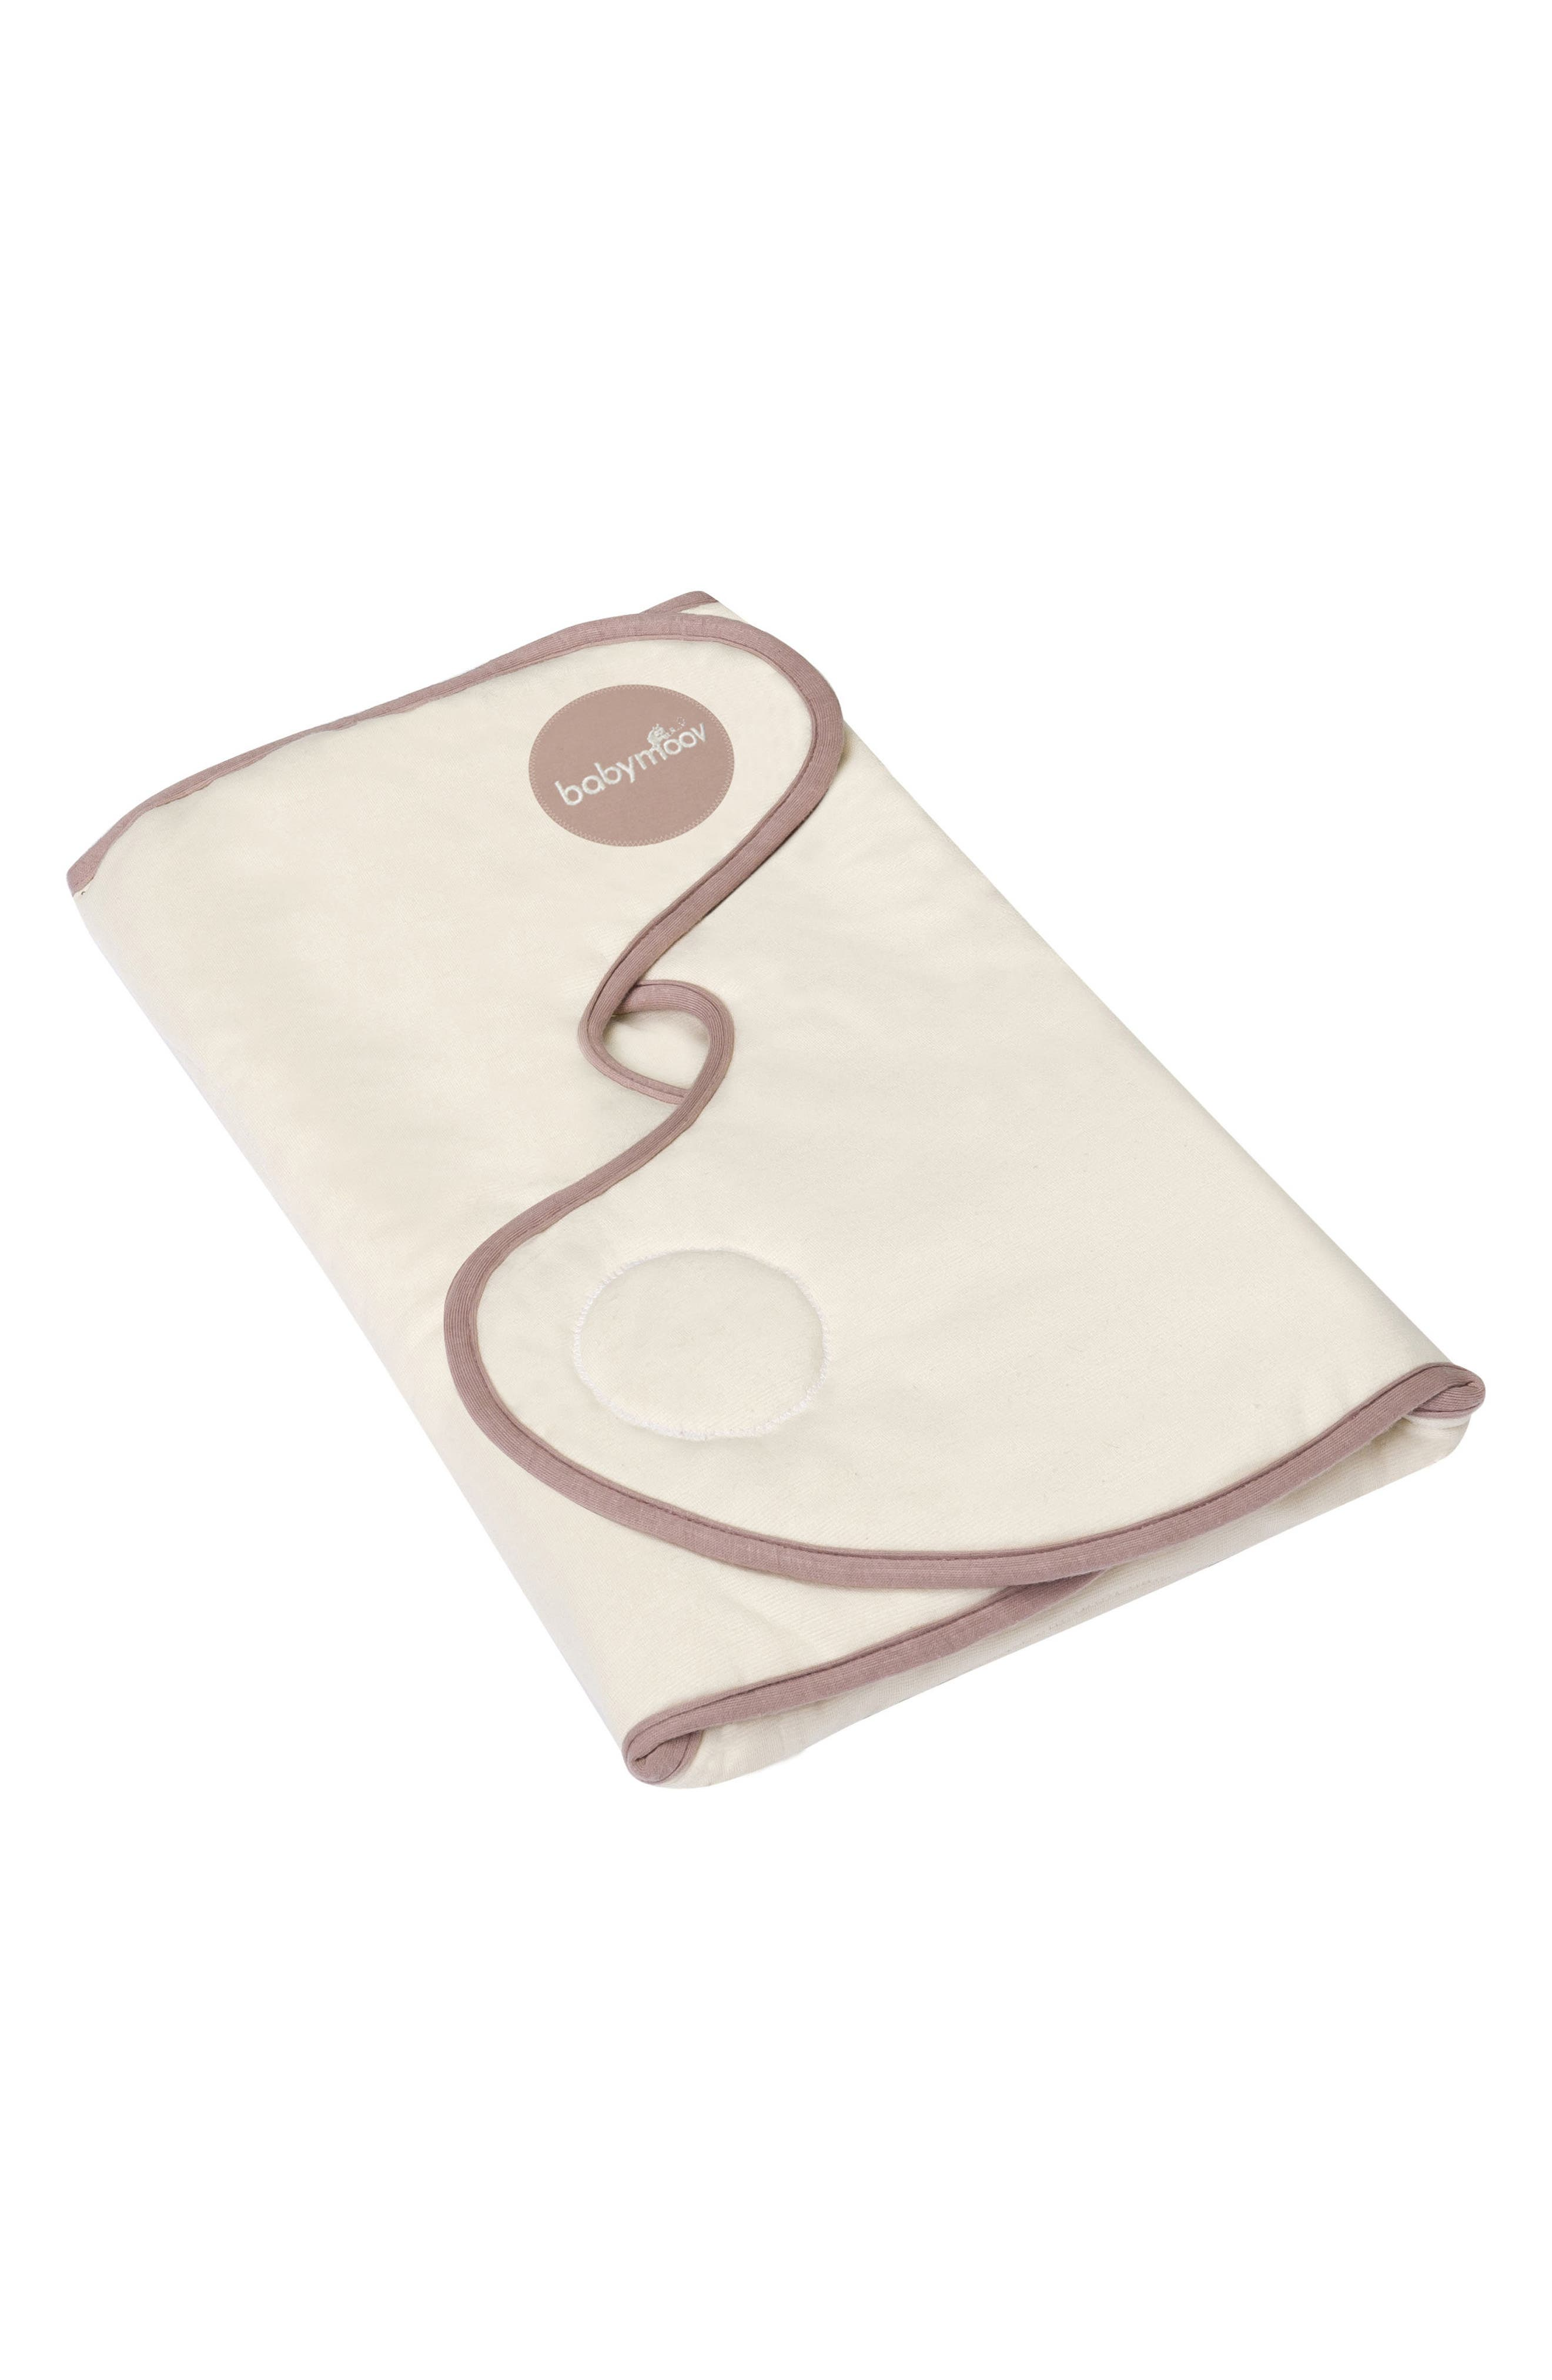 CozyCover Swaddle Wrap Blanket,                             Main thumbnail 1, color,                             900